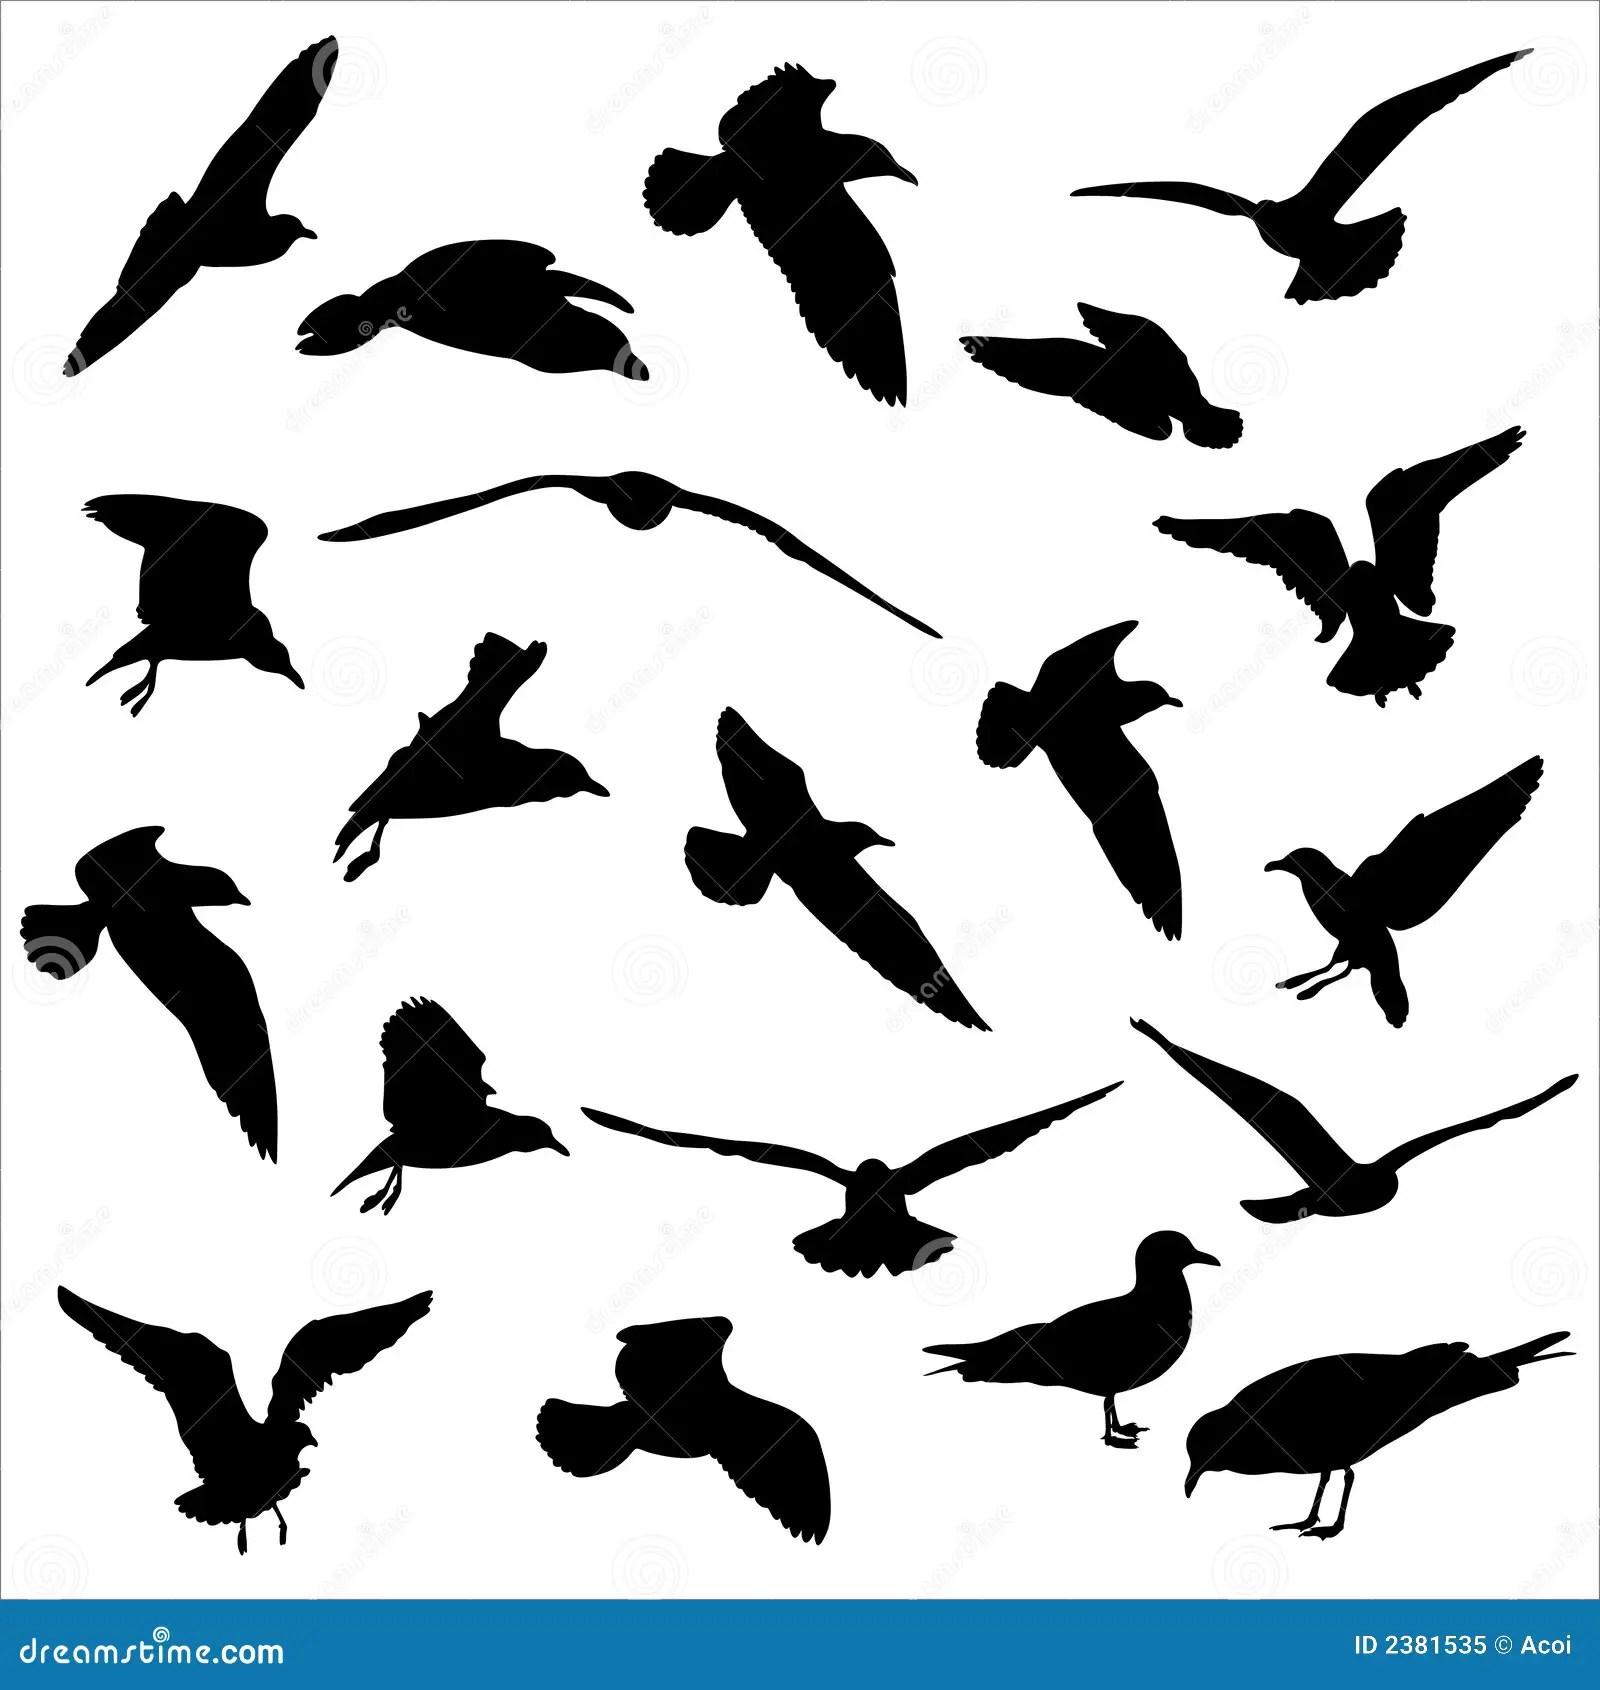 Seagulls Silhouettes Stock Vector Illustration Of